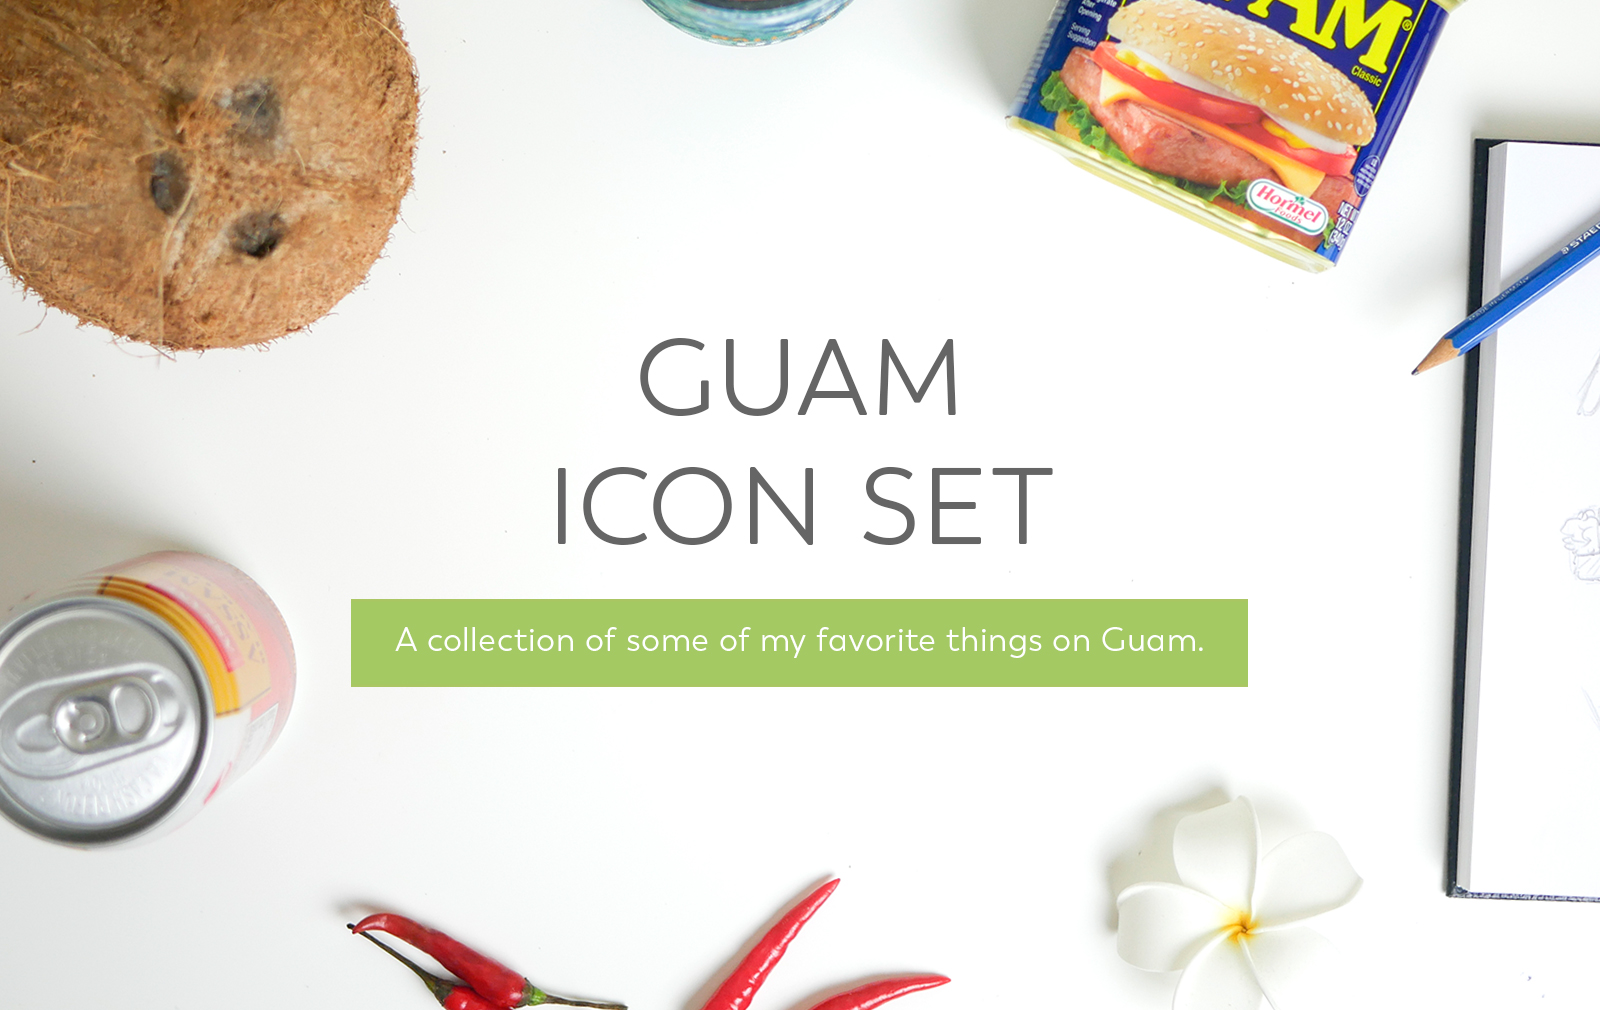 title-guam-icon.jpg